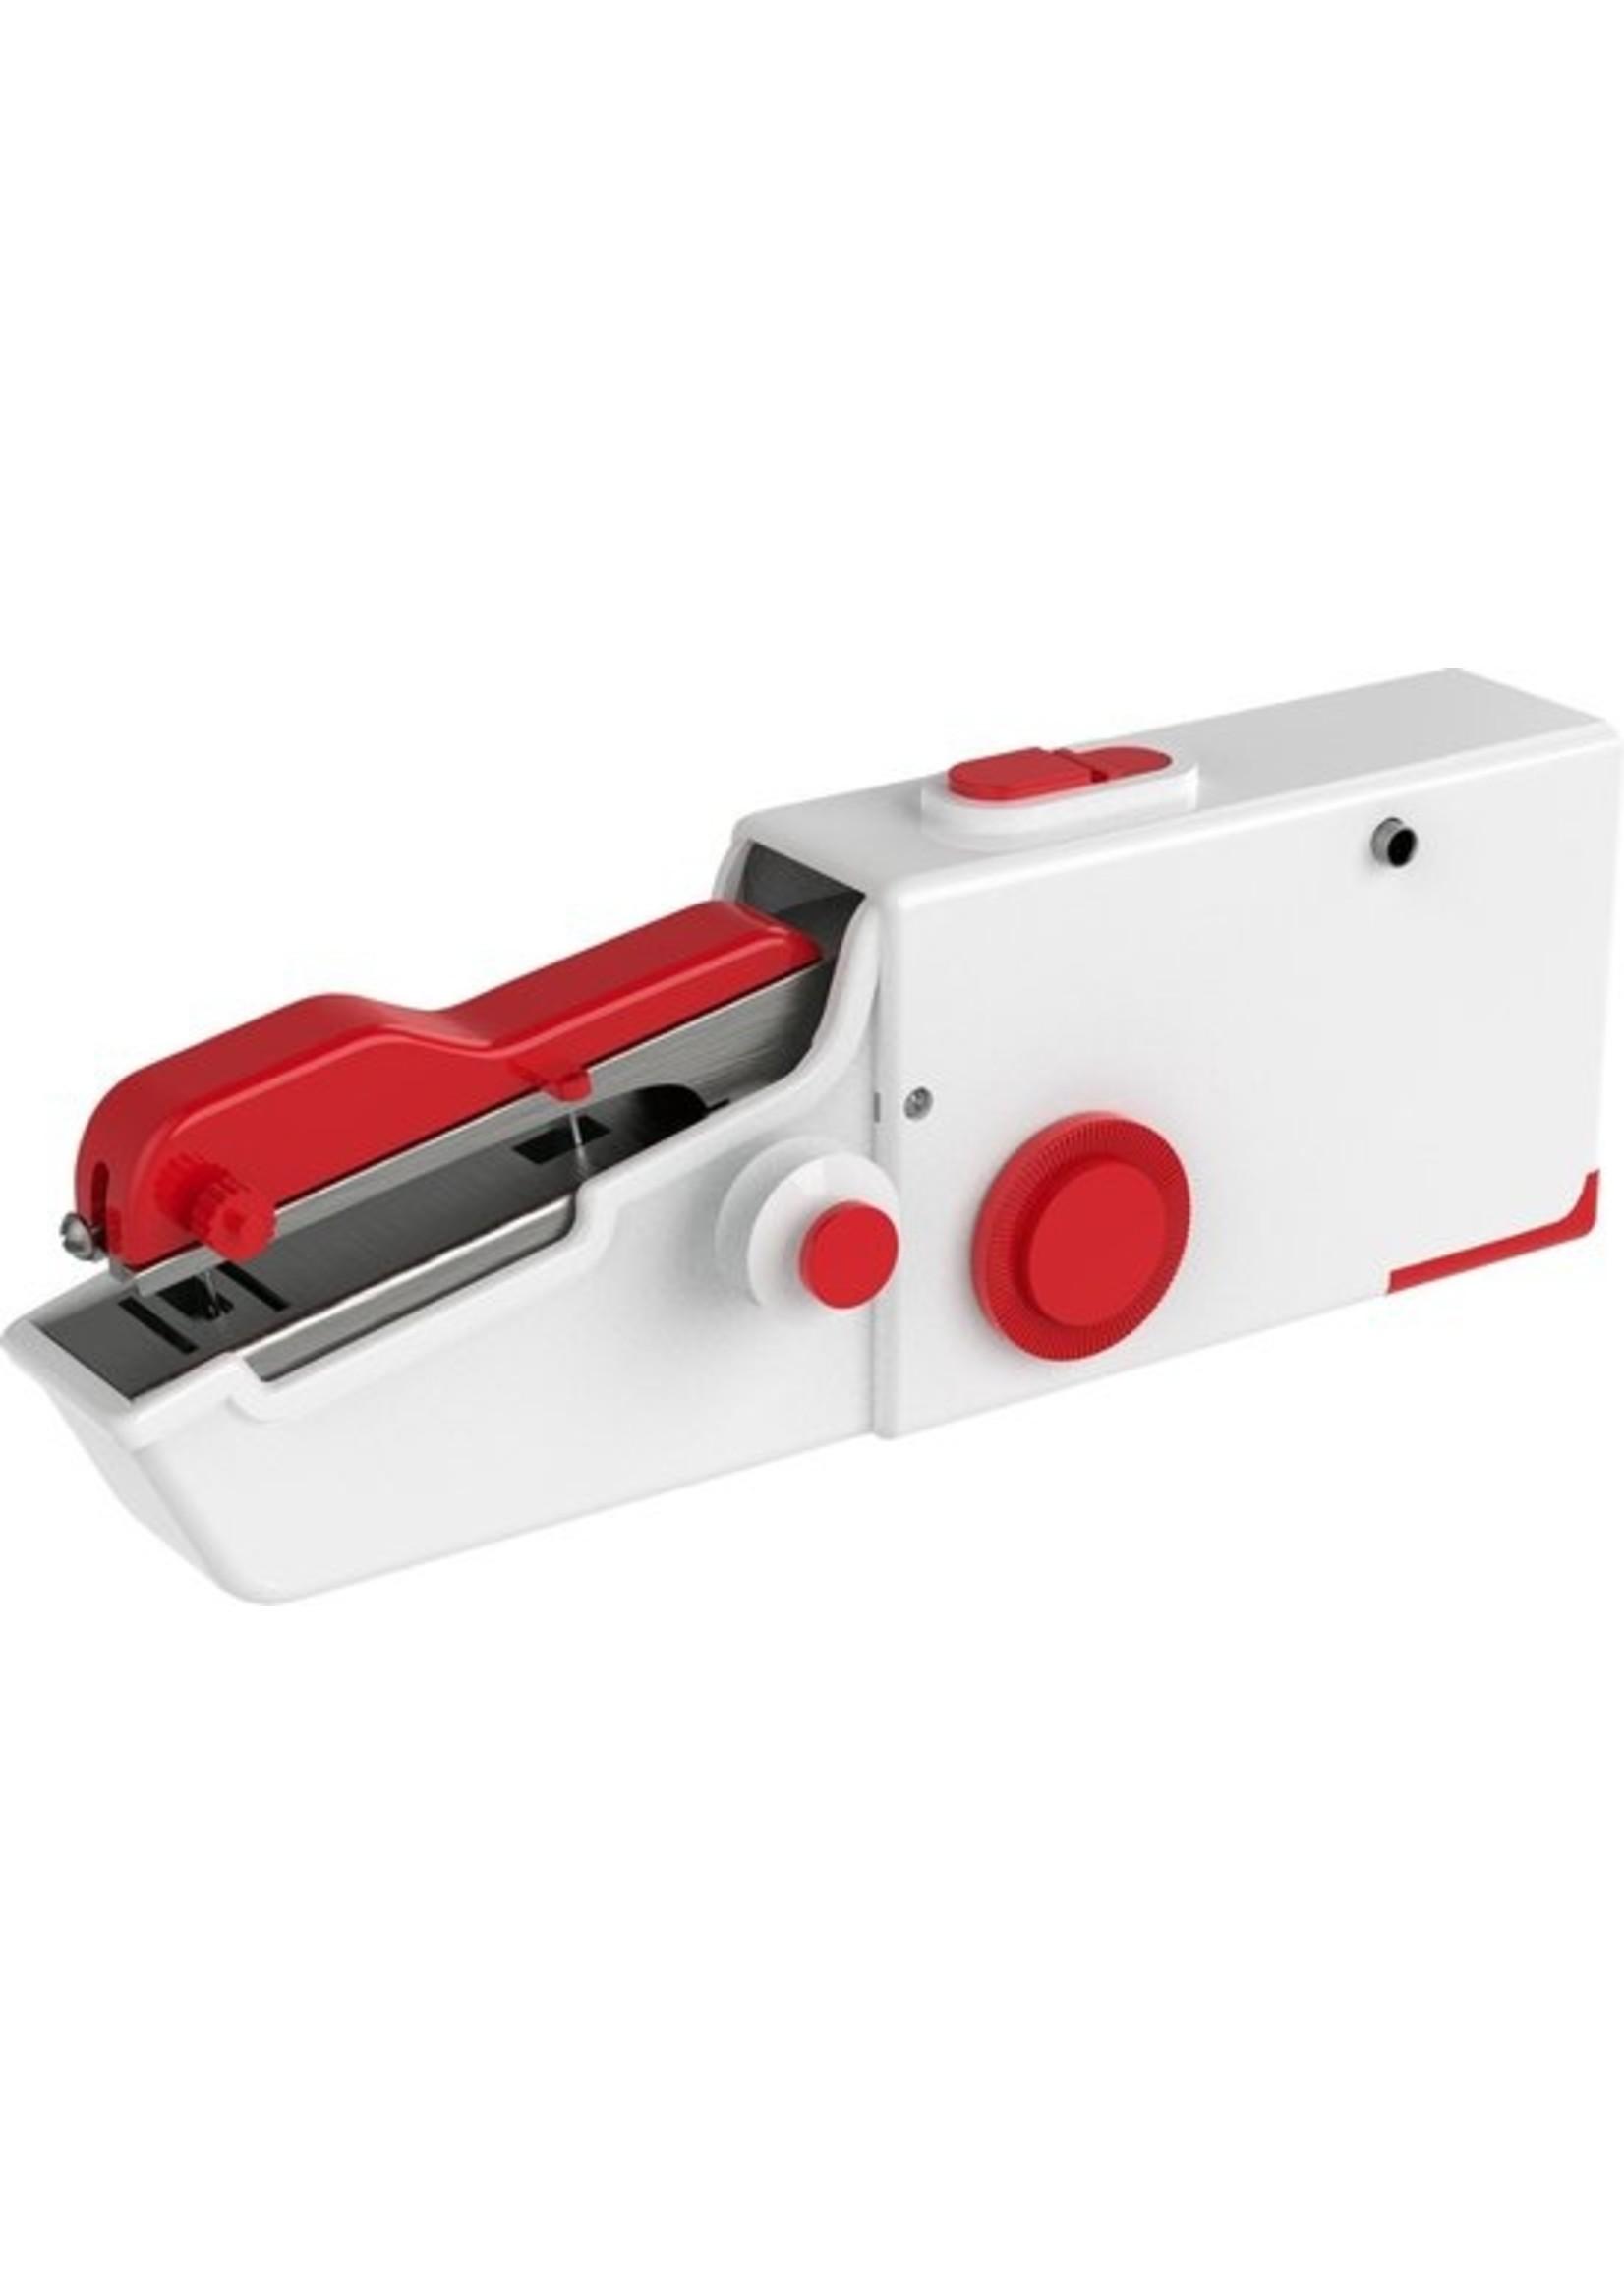 Cenocco Cenocco CC-9073: Easy Stitch Handheld Naaimachine koopjeshoek